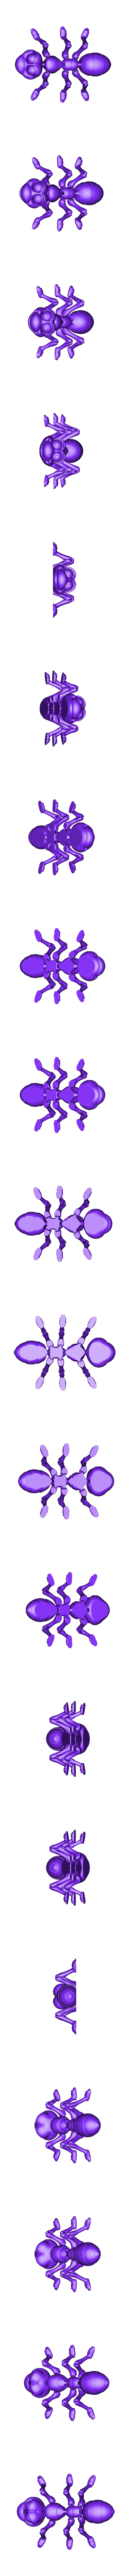 FlexiAnt.STL Download STL file Cute Flexi Print-in-Place Ant • 3D printing design, FlexiFactory